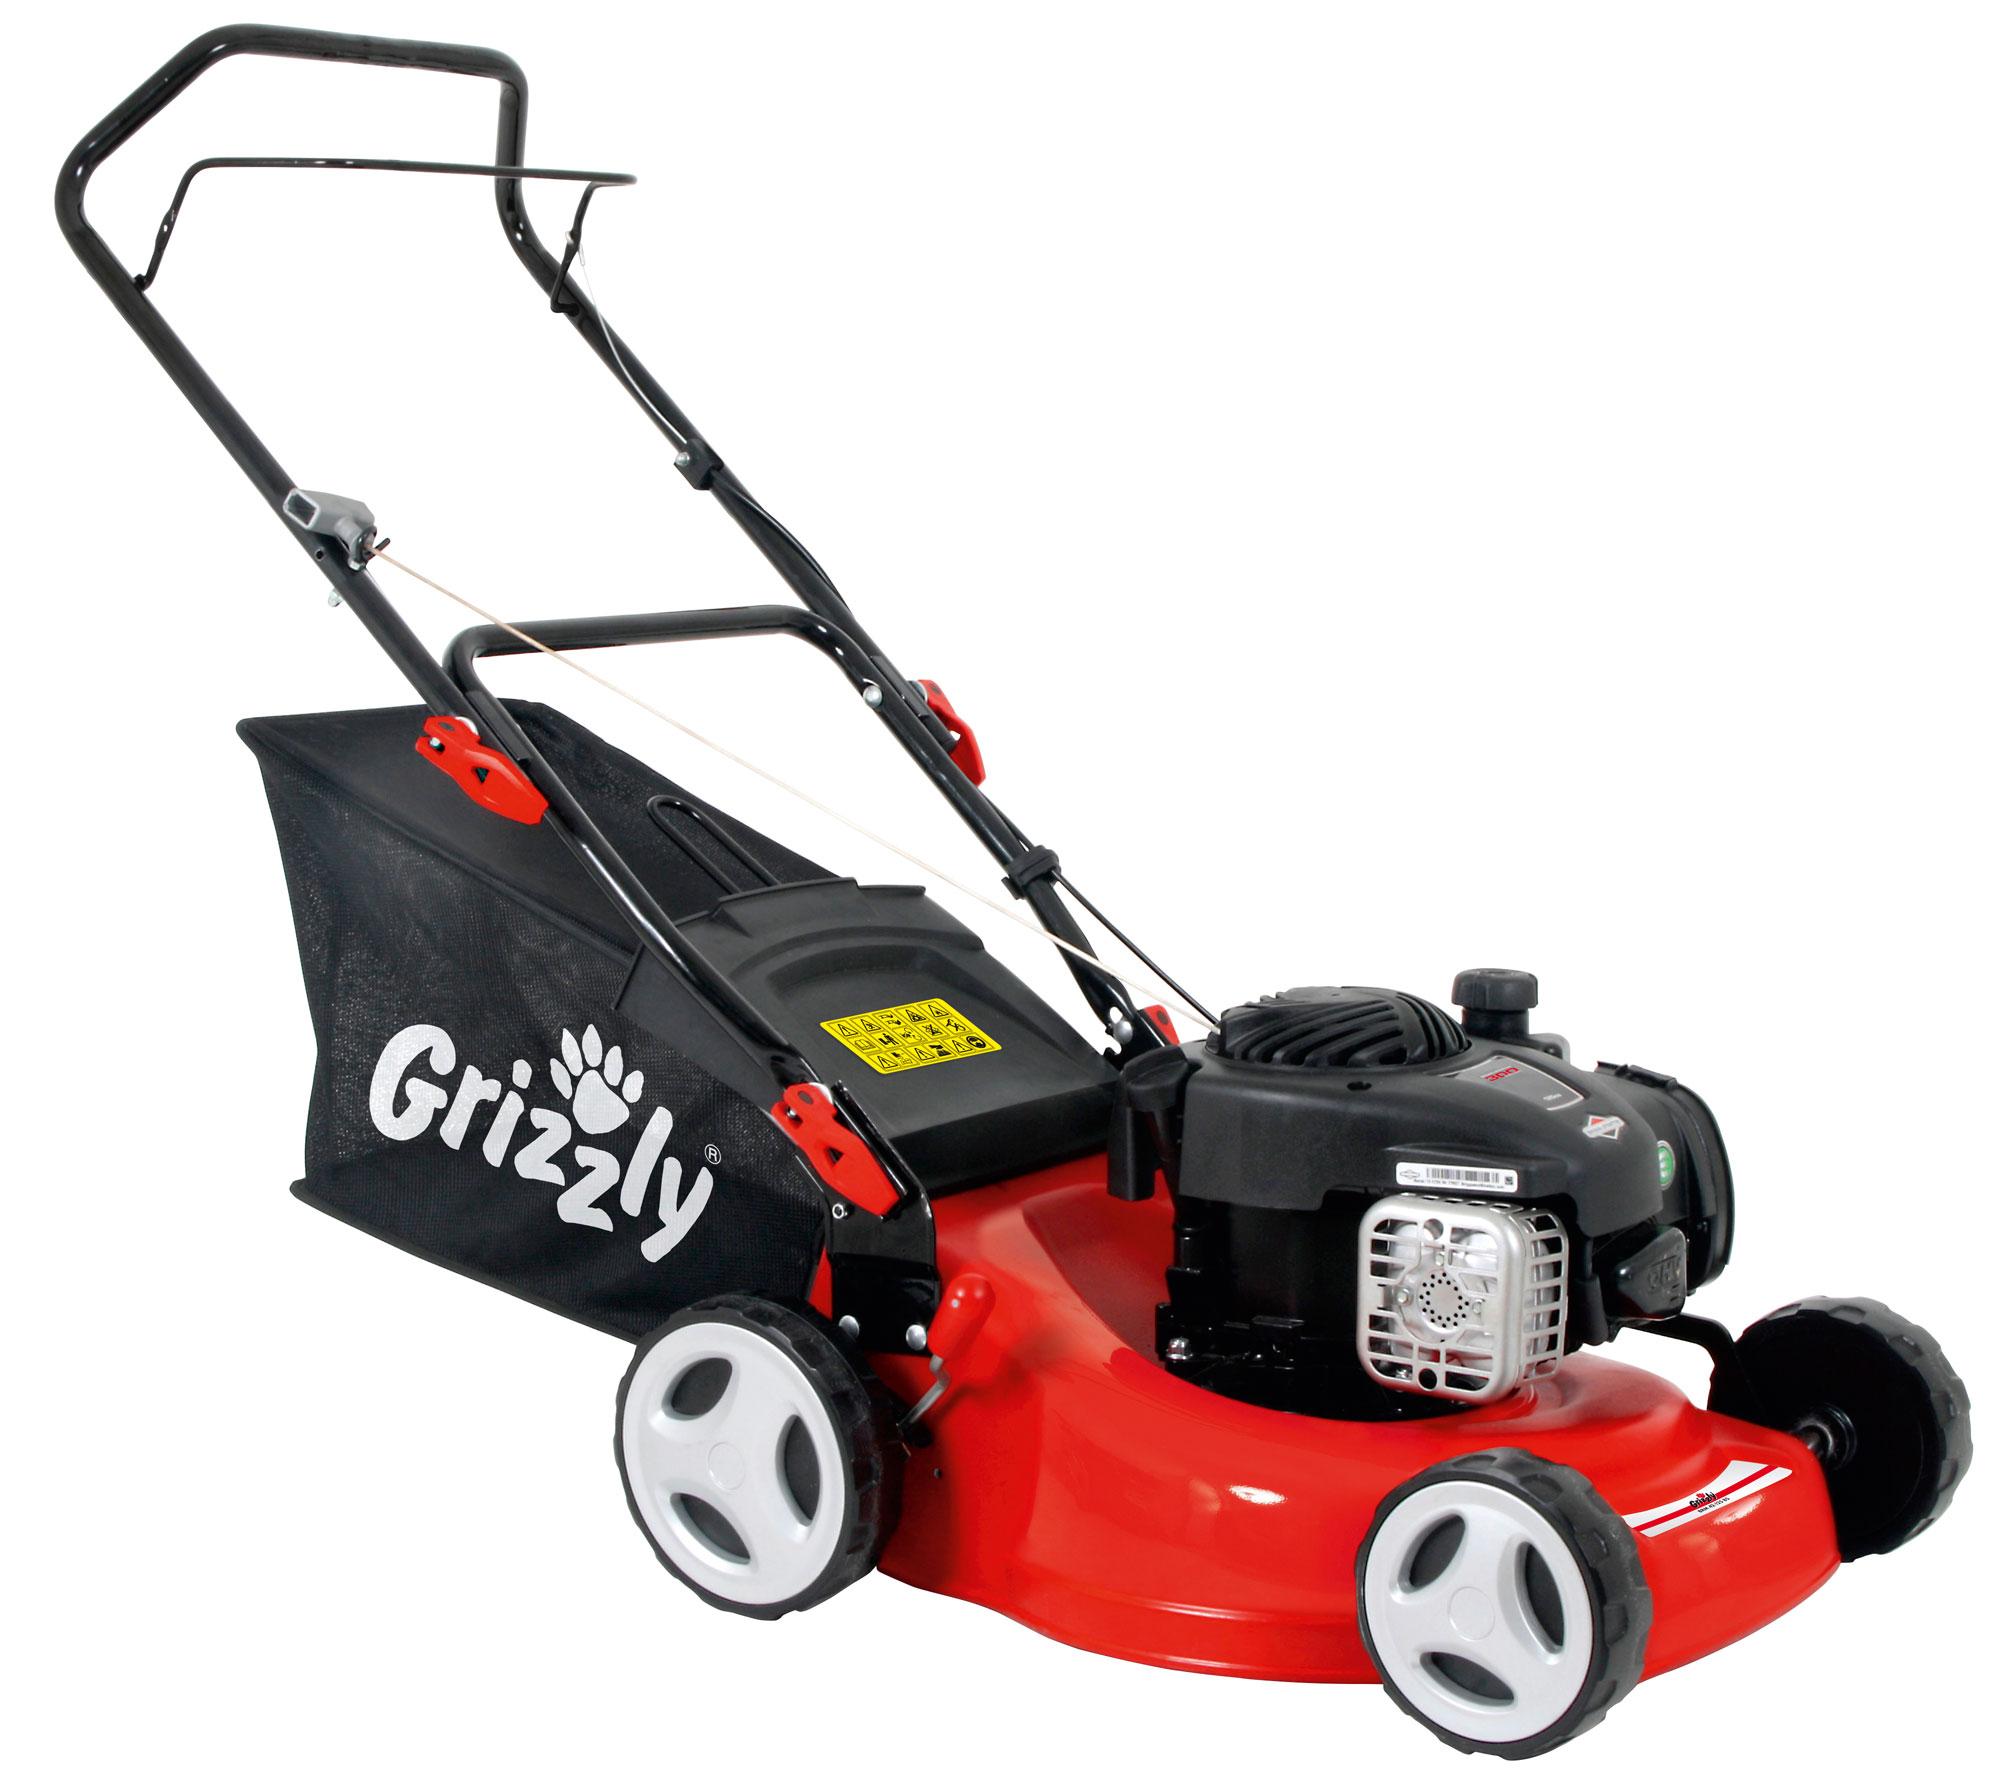 Benzin Rasenmäher Grizzly BRM 24 125 BS mit B&S Motor 1,82kW SB 42cm Bild 1